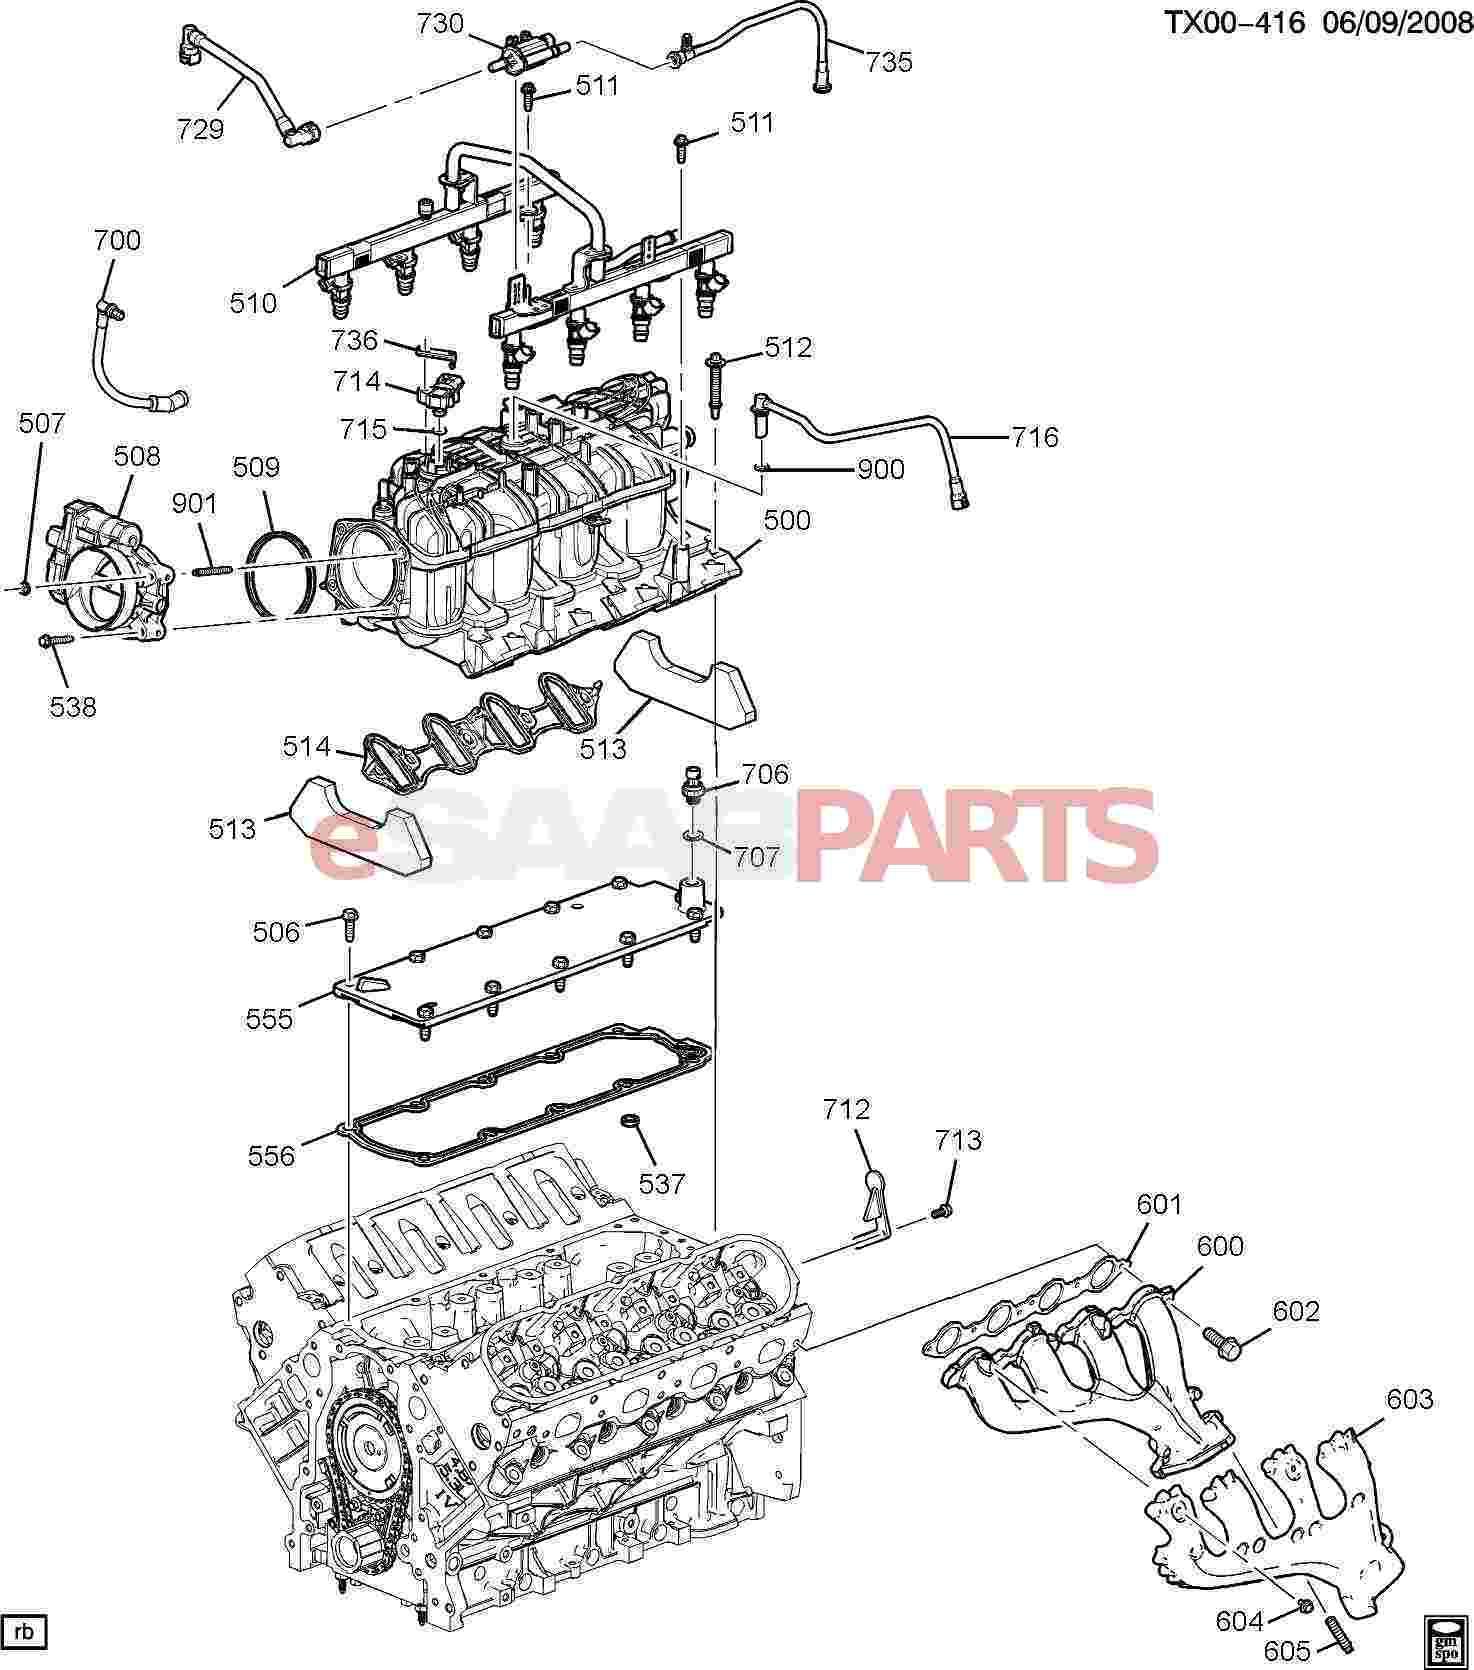 esaabparts com - saab 9-7x > engine parts > engine internal 6 0h > engine  asm-6 0l v8 part 5 manifold & fuel related parts (6 0h)